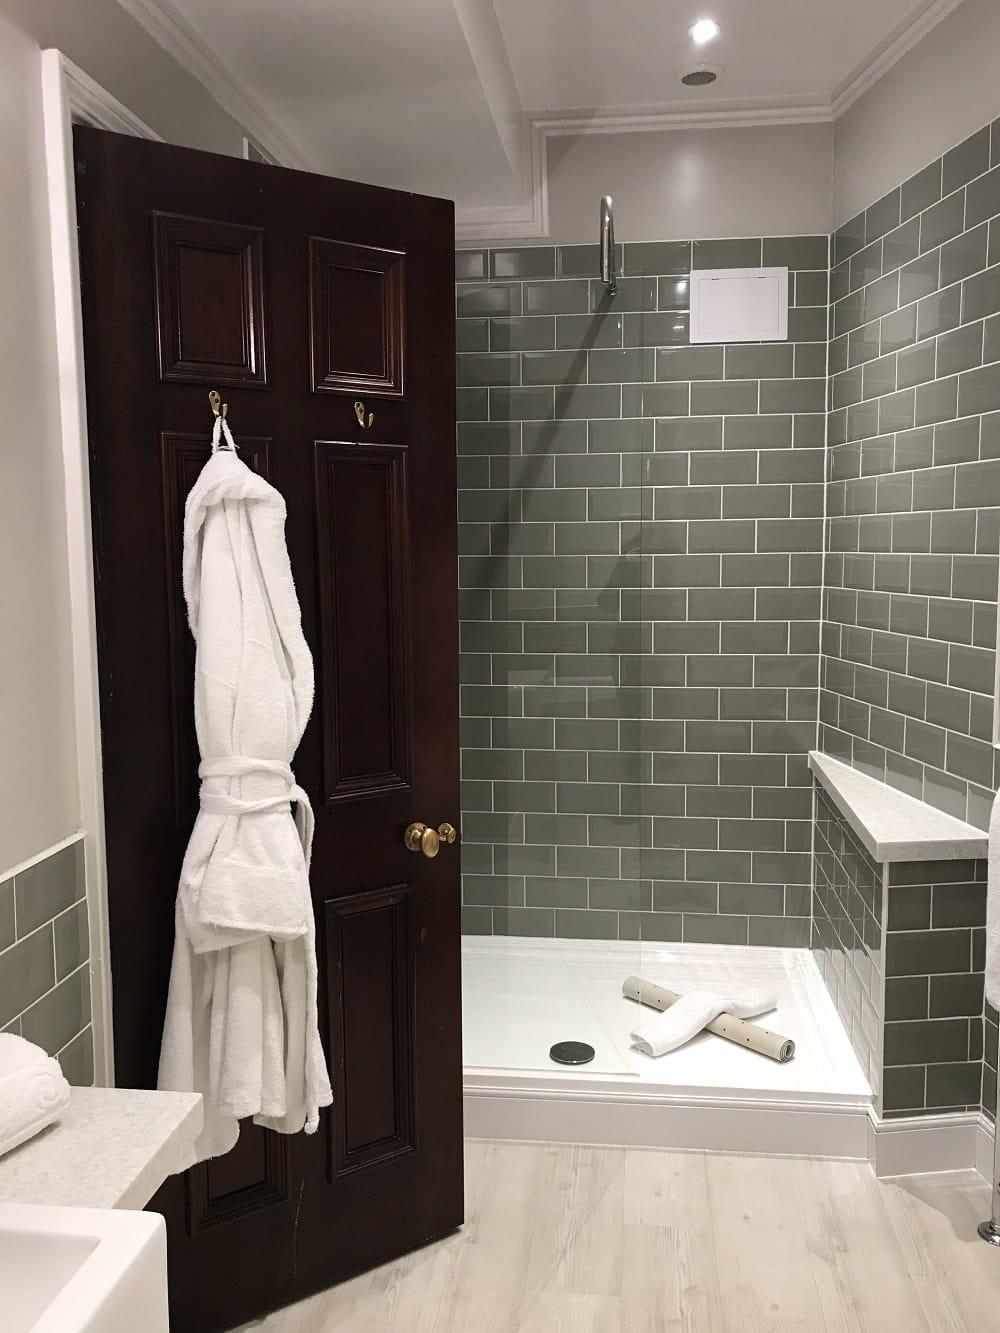 badewanne dusche affordable badewanne dusche with badewanne dusche artweger duschen twinline. Black Bedroom Furniture Sets. Home Design Ideas